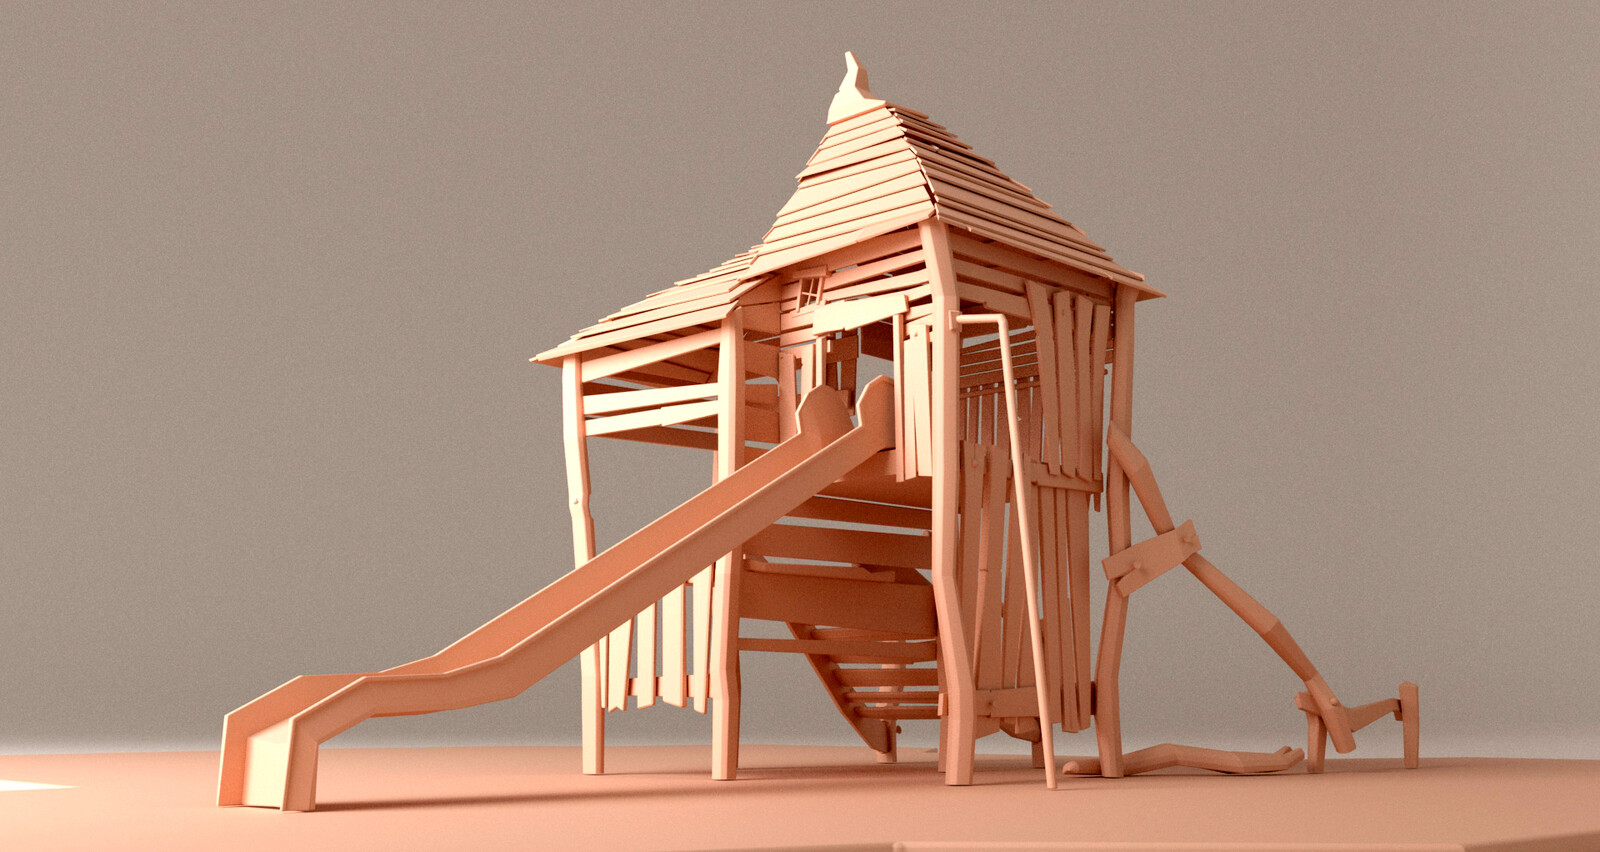 3D model, close-up, main building, back view